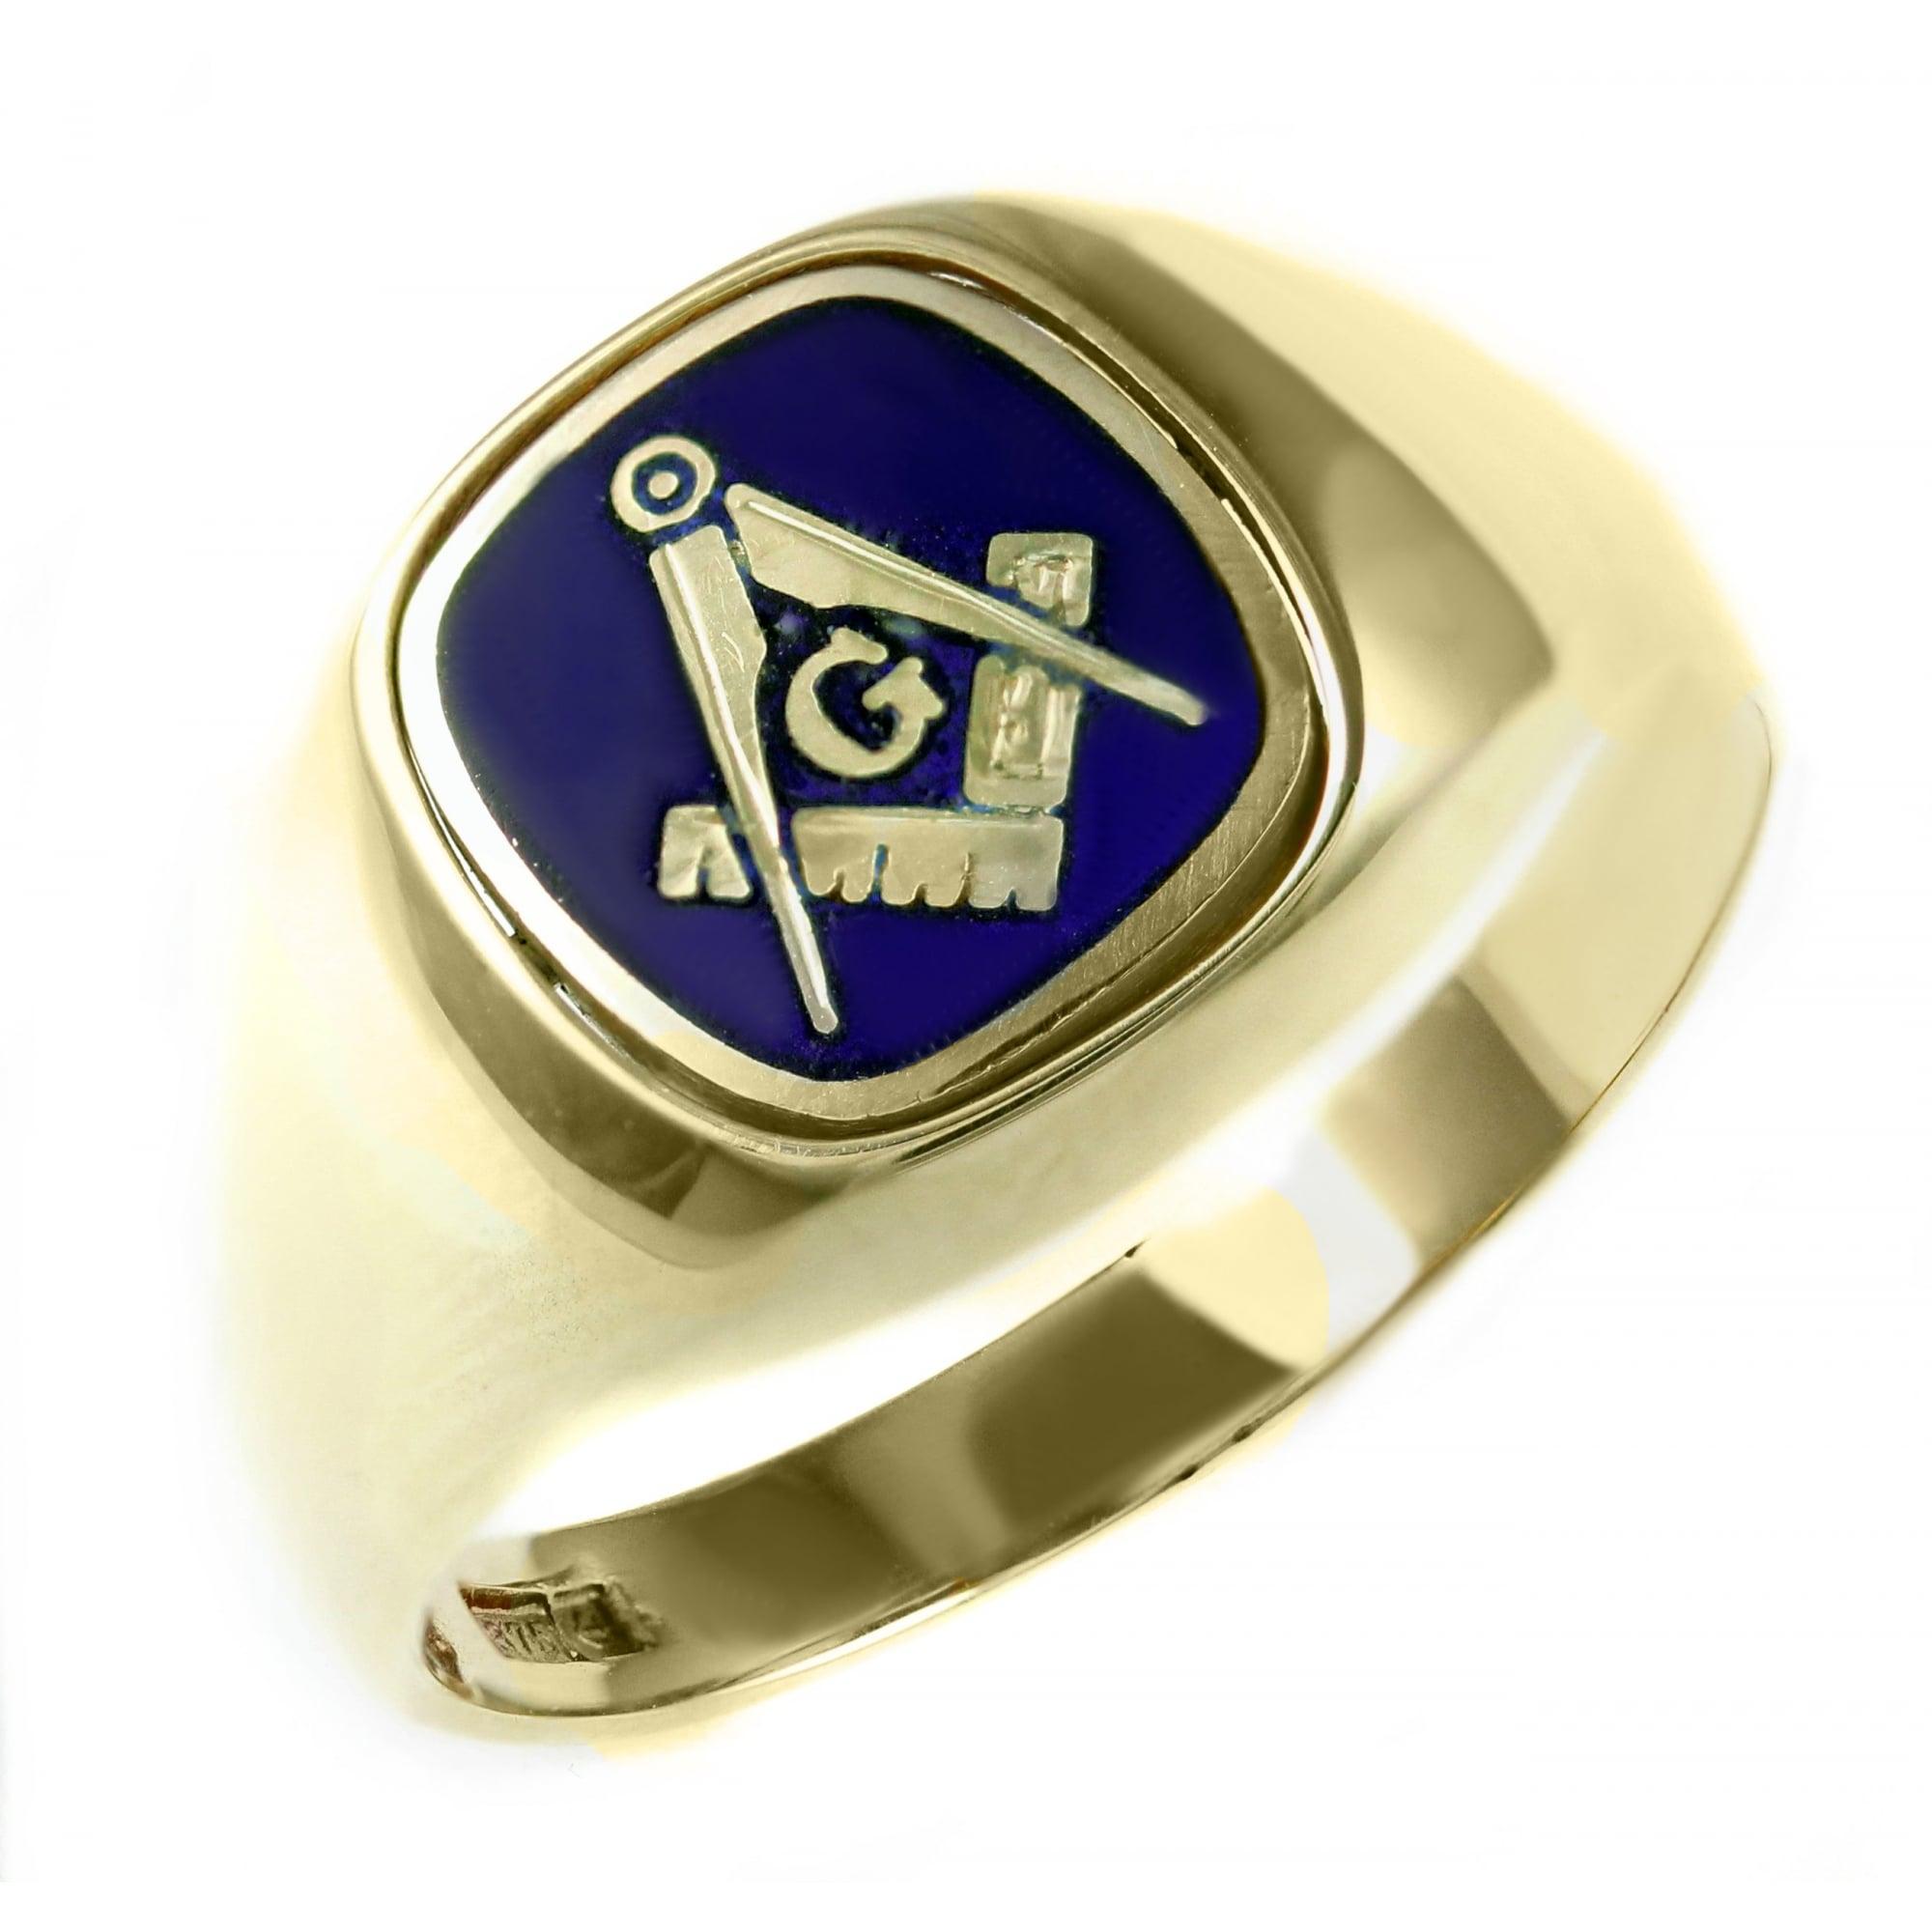 9ct yellow gold cushion masonic swivel signet ring. (T